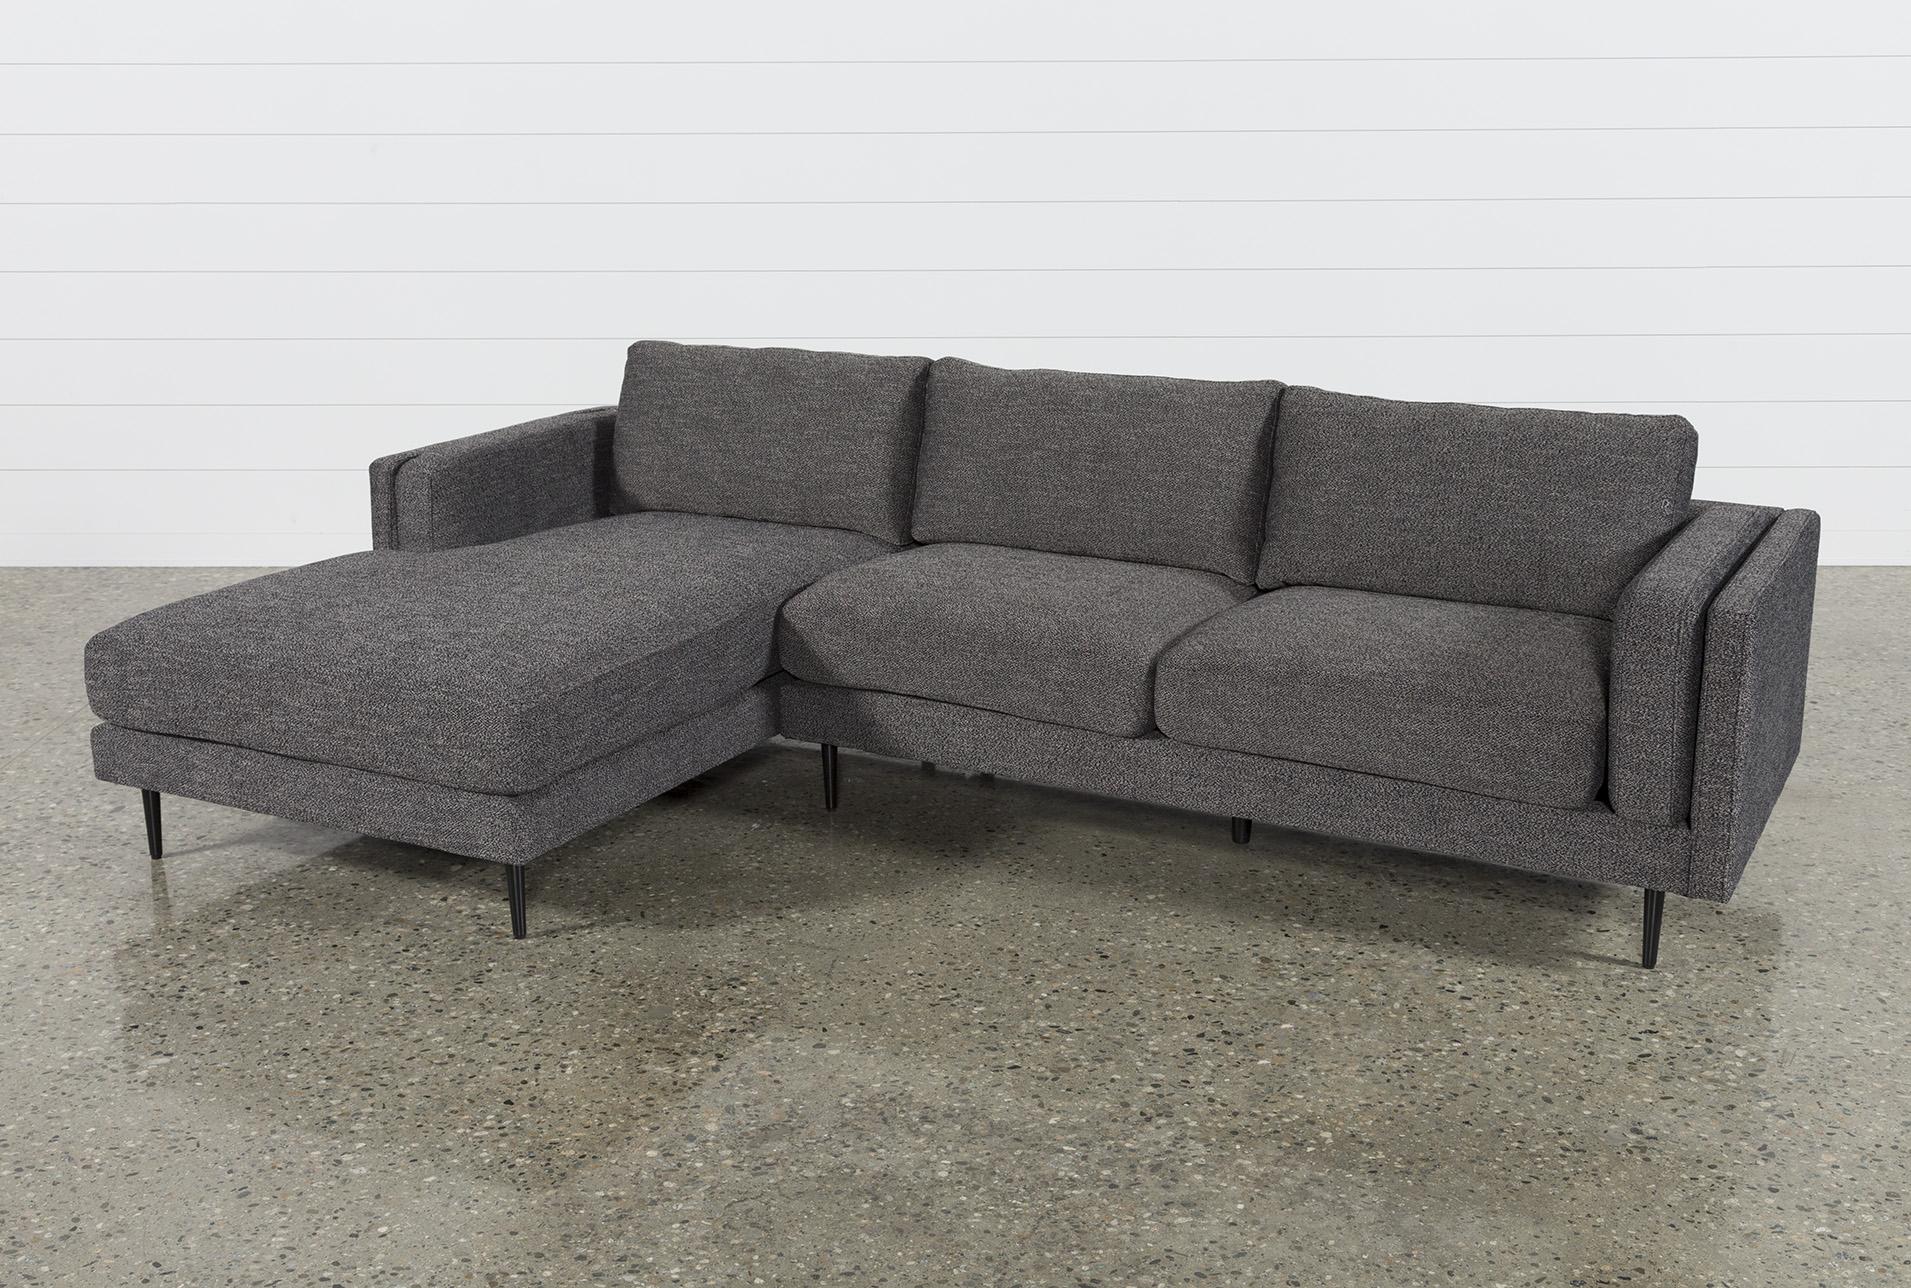 Aquarius Dark Grey 2 Piece Sectional W/laf Chaise In 2018 | Products In Aquarius Dark Grey Sofa Chairs (Image 4 of 20)